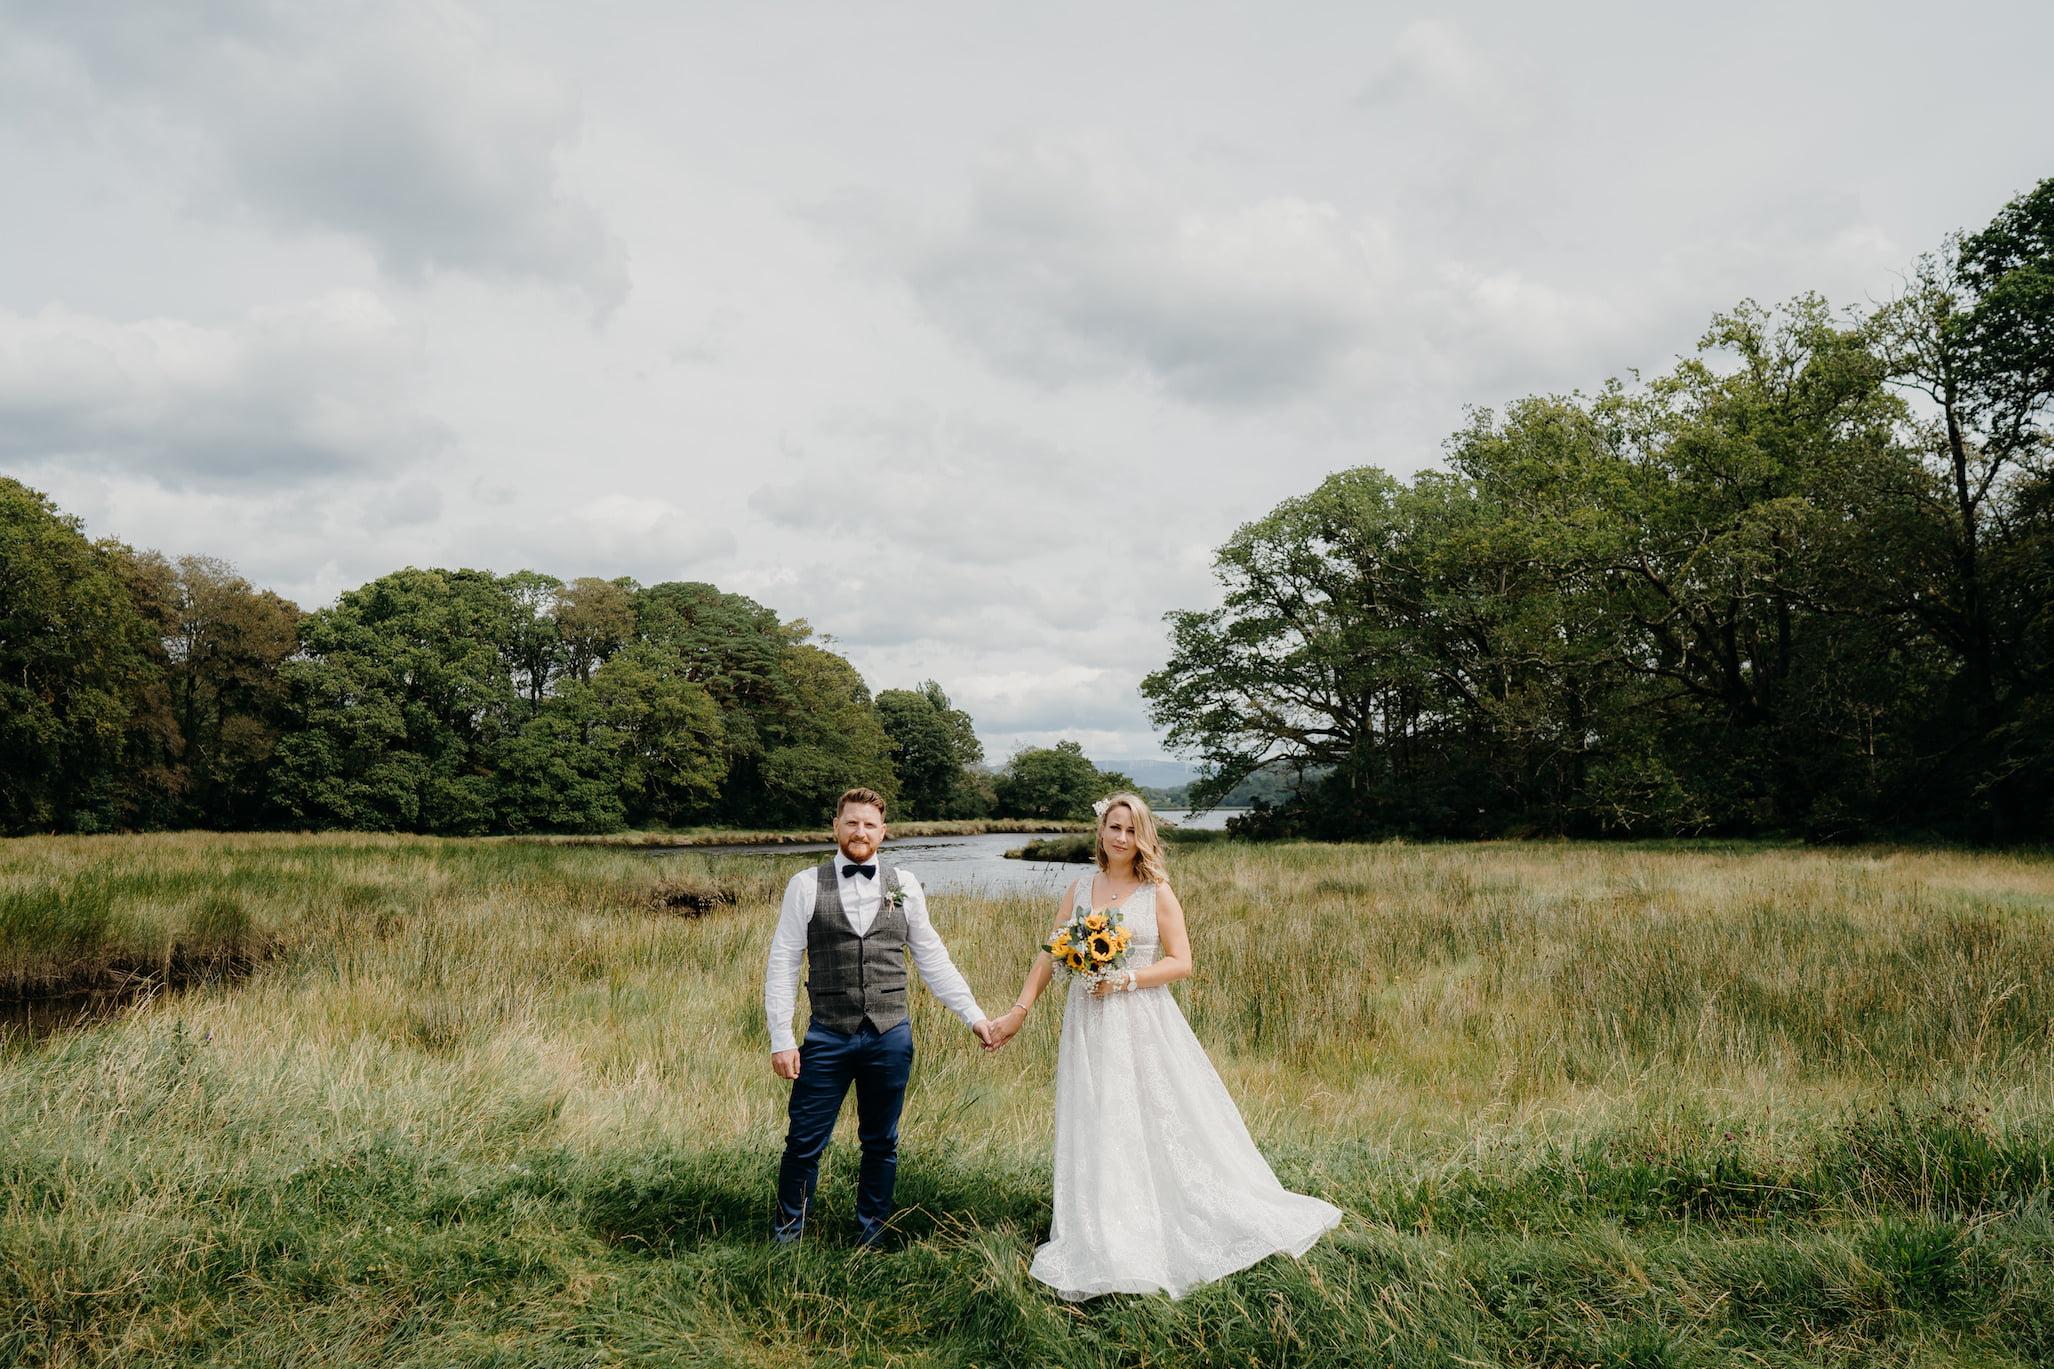 Dromquinna Manor Wedding - Relaxed Kerry Wedding Photography 97